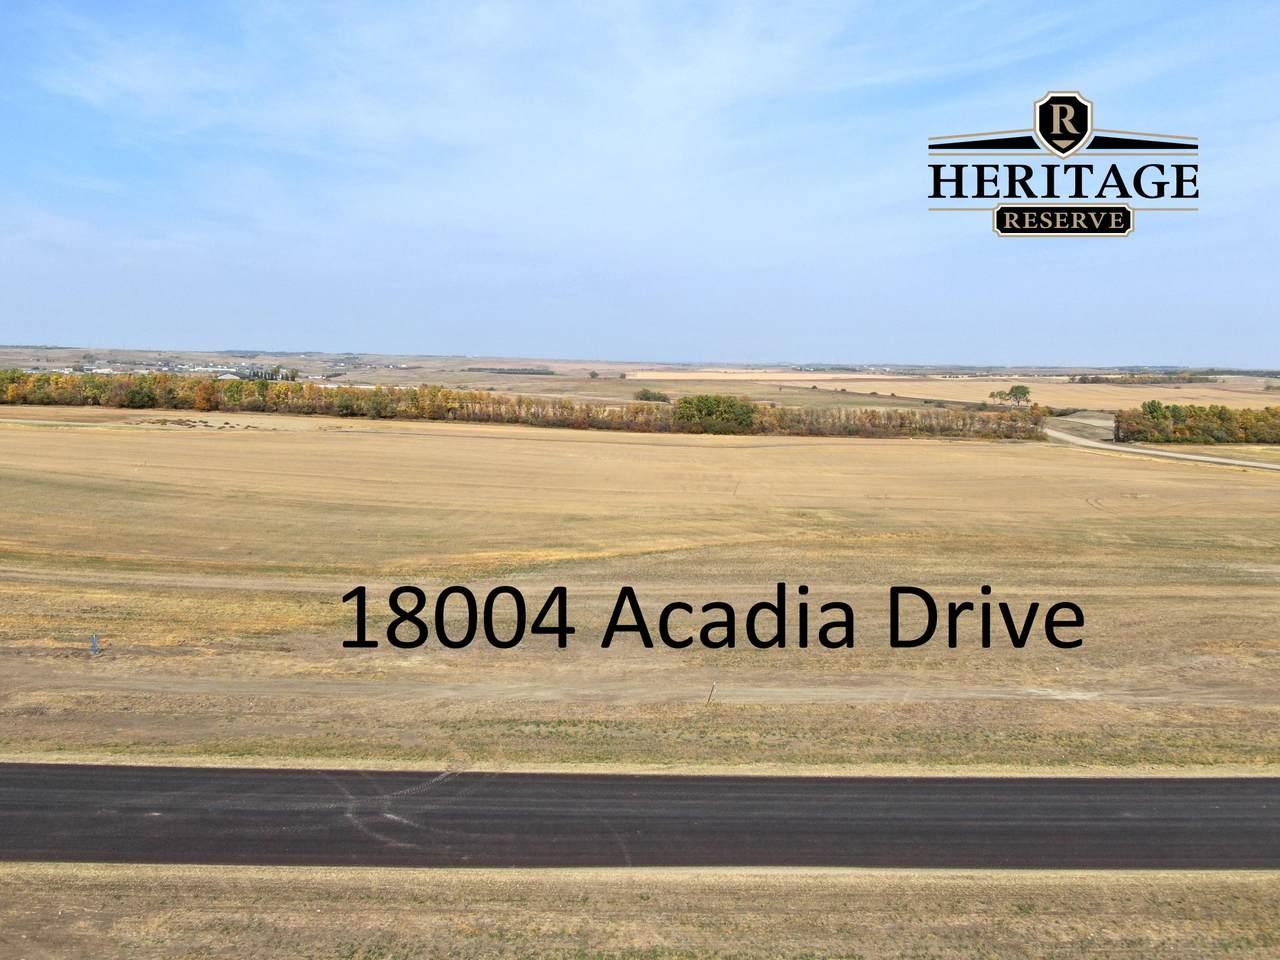 18004 Acadia Drive - Photo 1